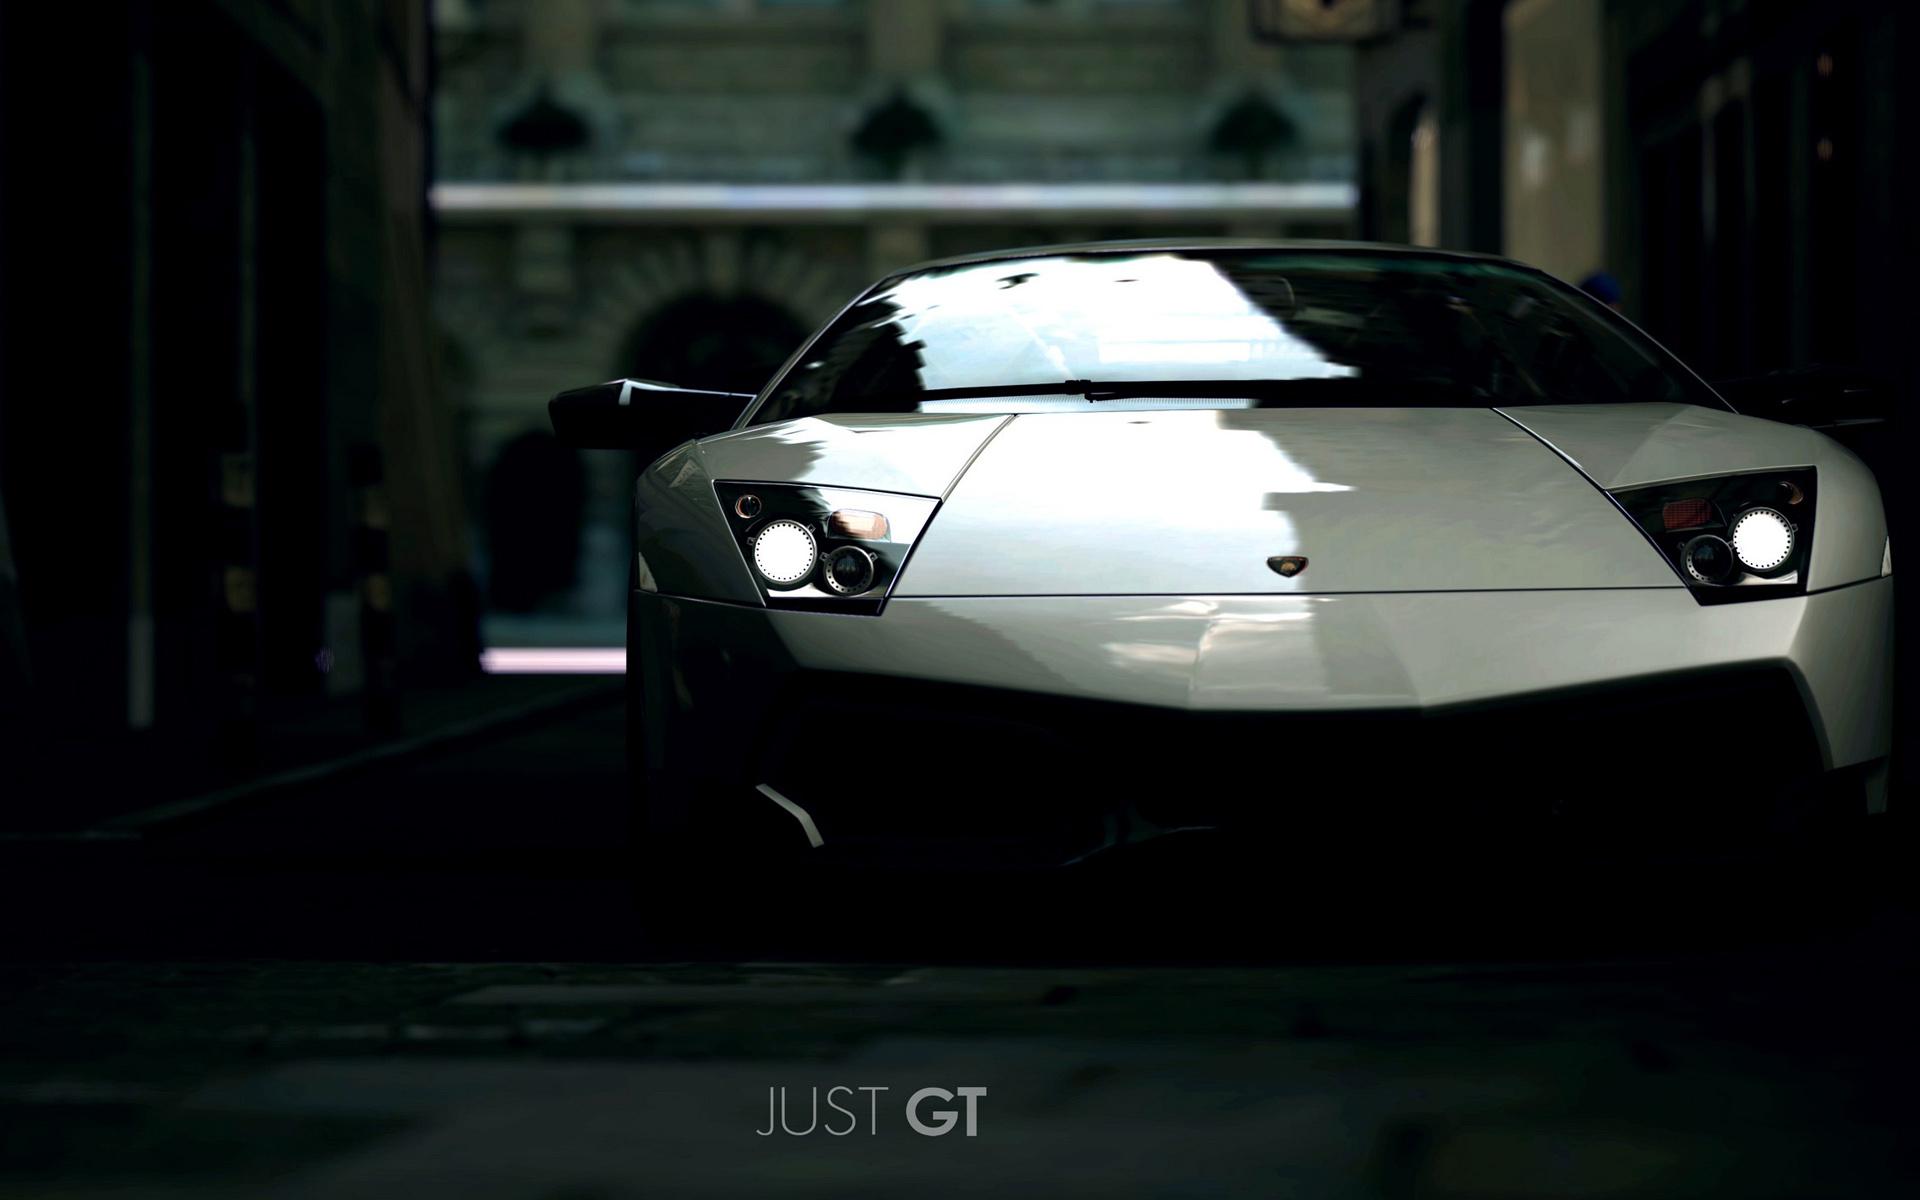 Lamborghini GT Wallpapers HD Wallpapers 1920x1200